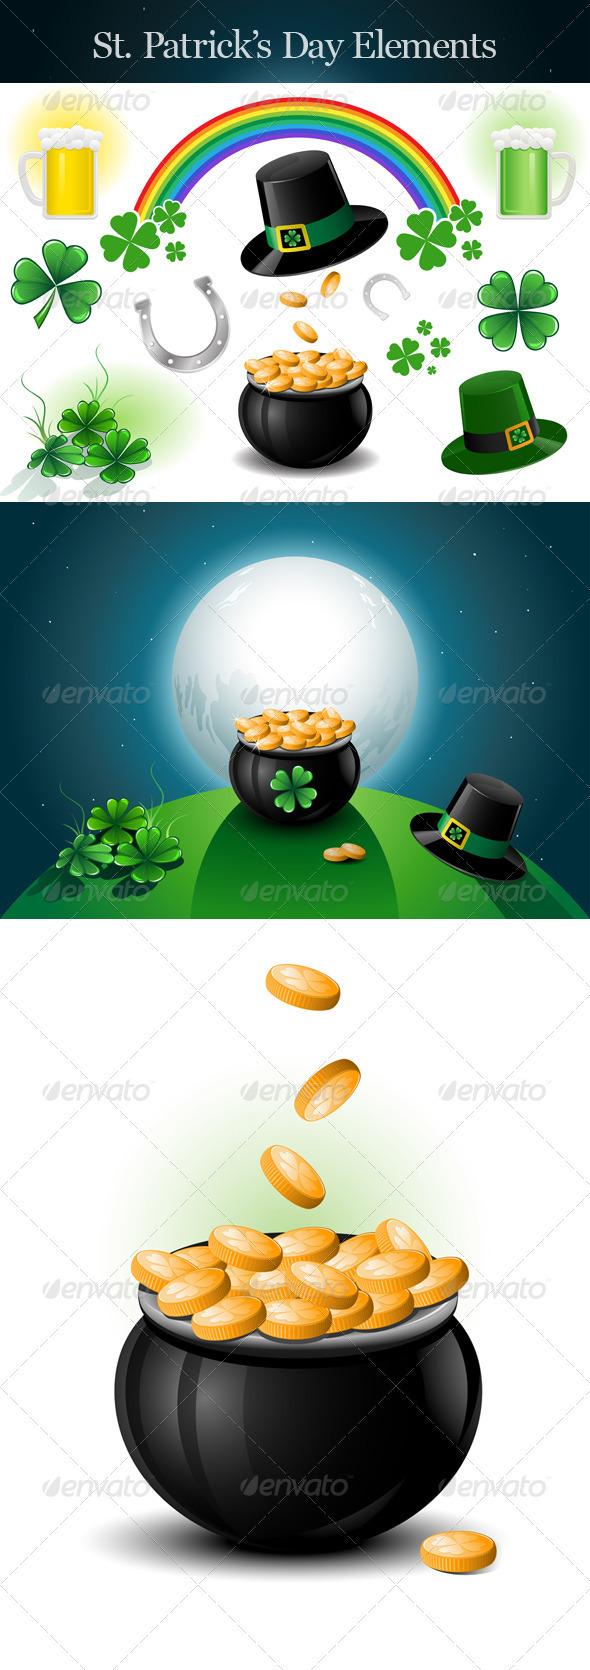 St. Patrick's Day Design Elements.